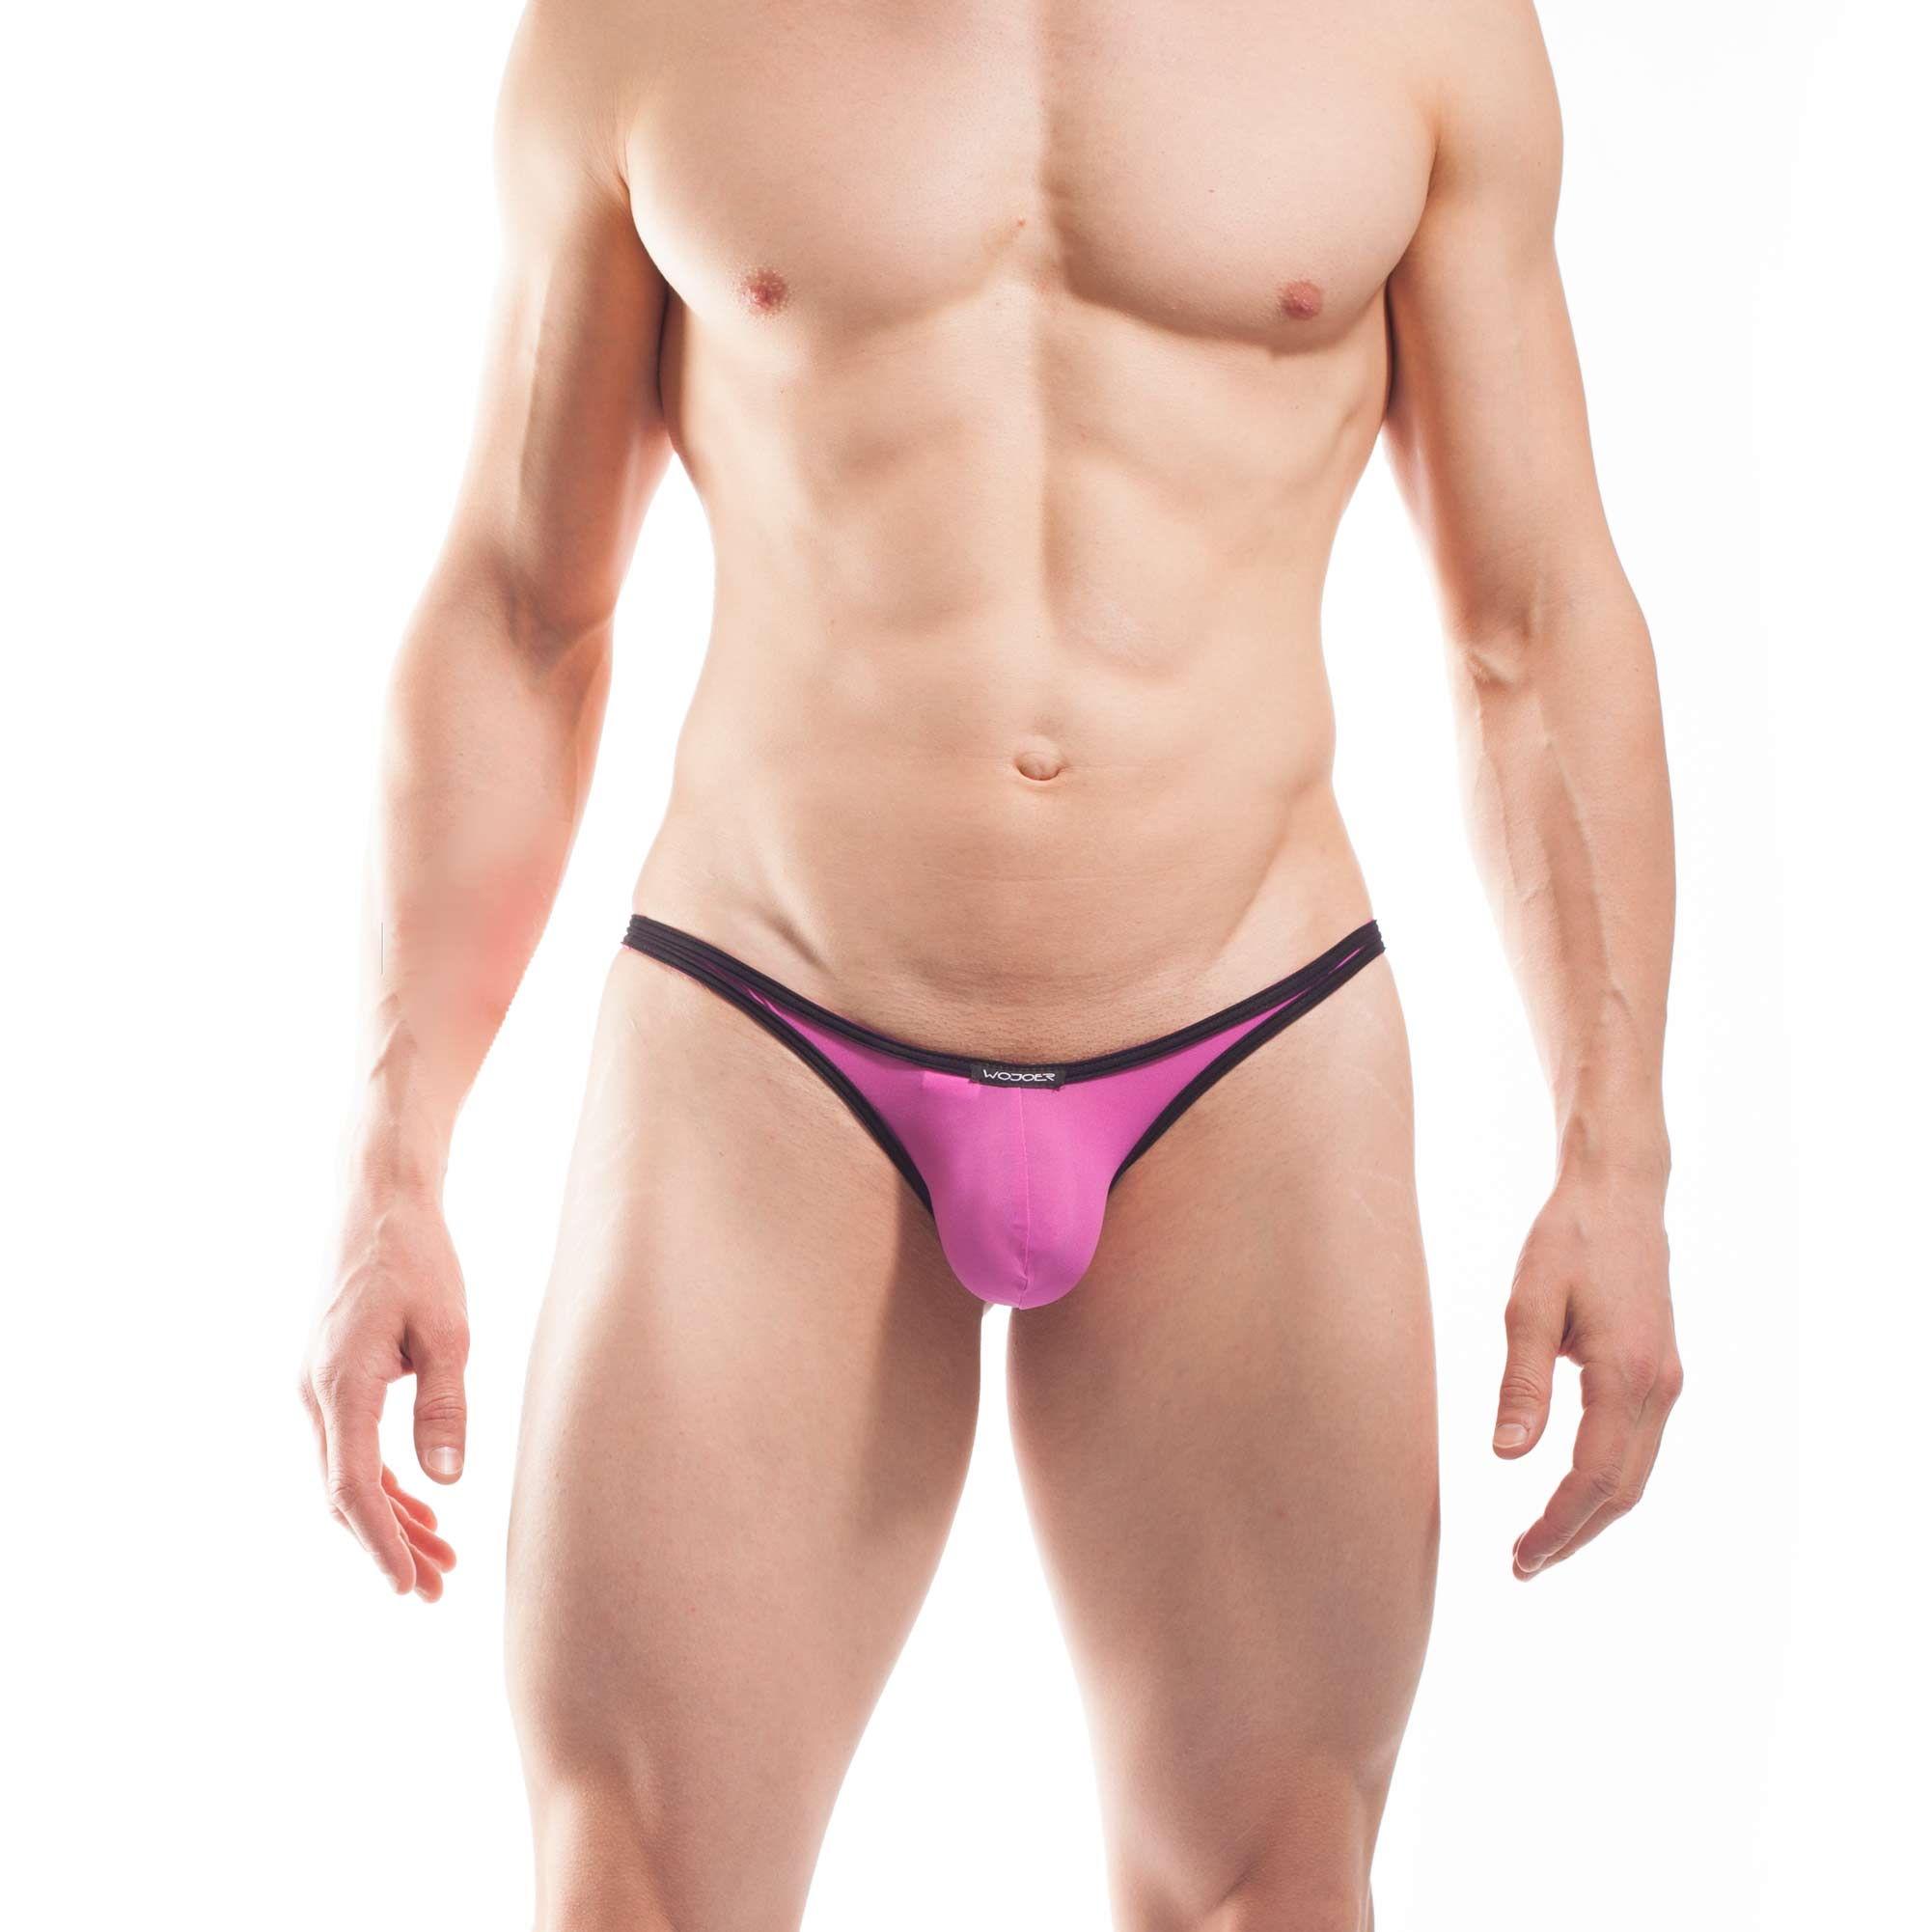 BEUN STRIPE MINI PUSH UP STRING, String, Tube, knappe Badehose, swim trunks, kontrast Ränder, schwarze Börtchen, candy pink, feilchen lila